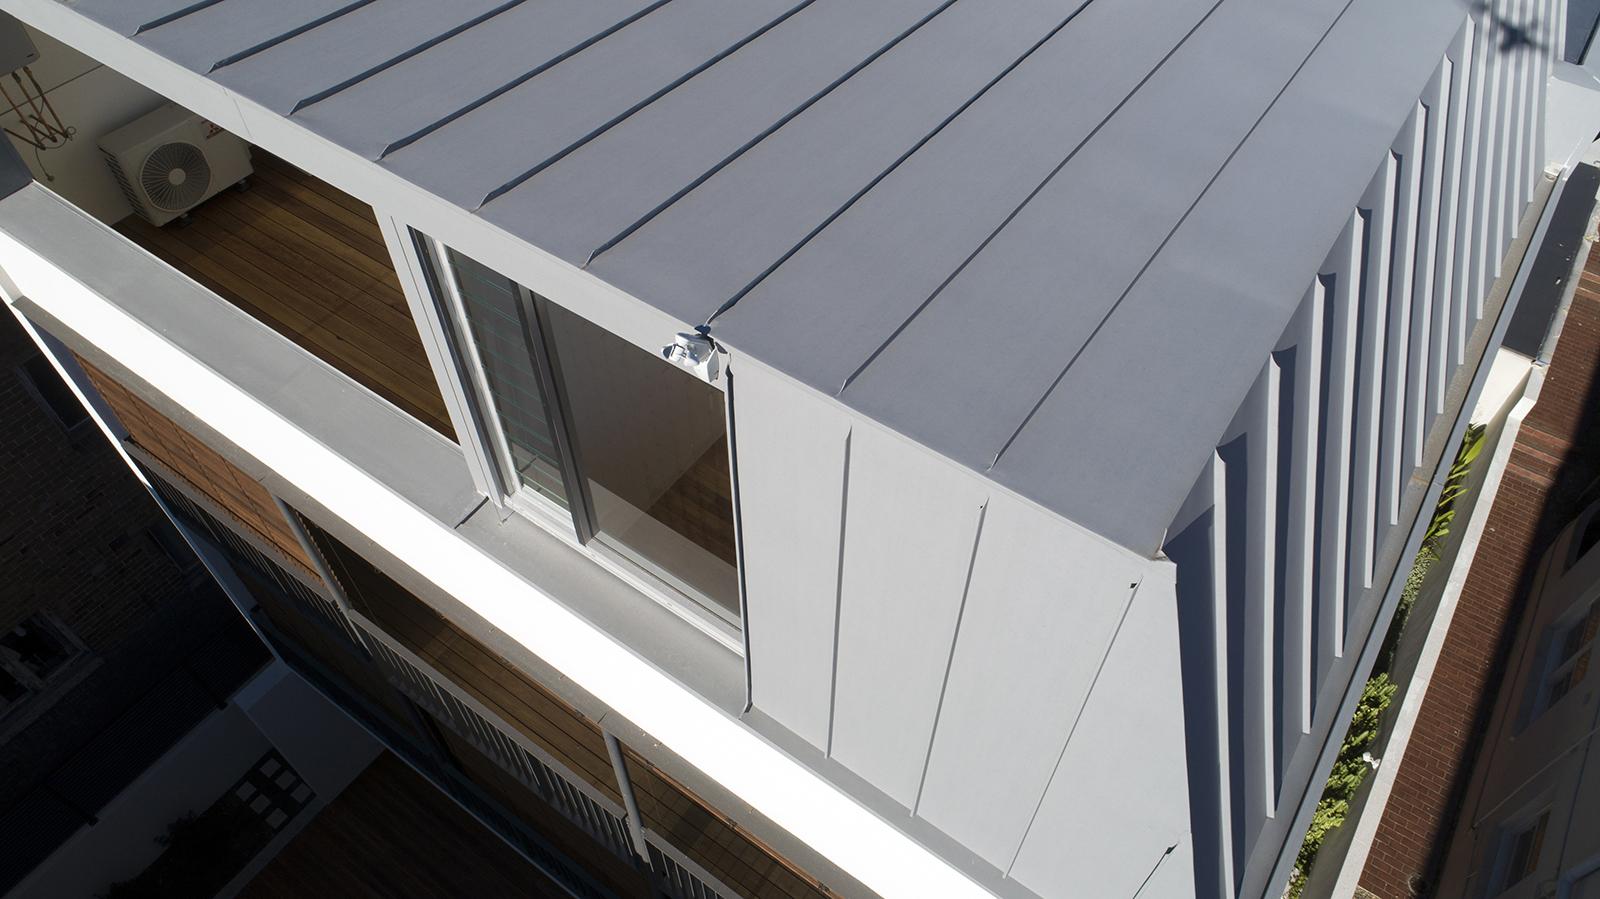 Bondi Apartments Roofing Group Pty Ltd